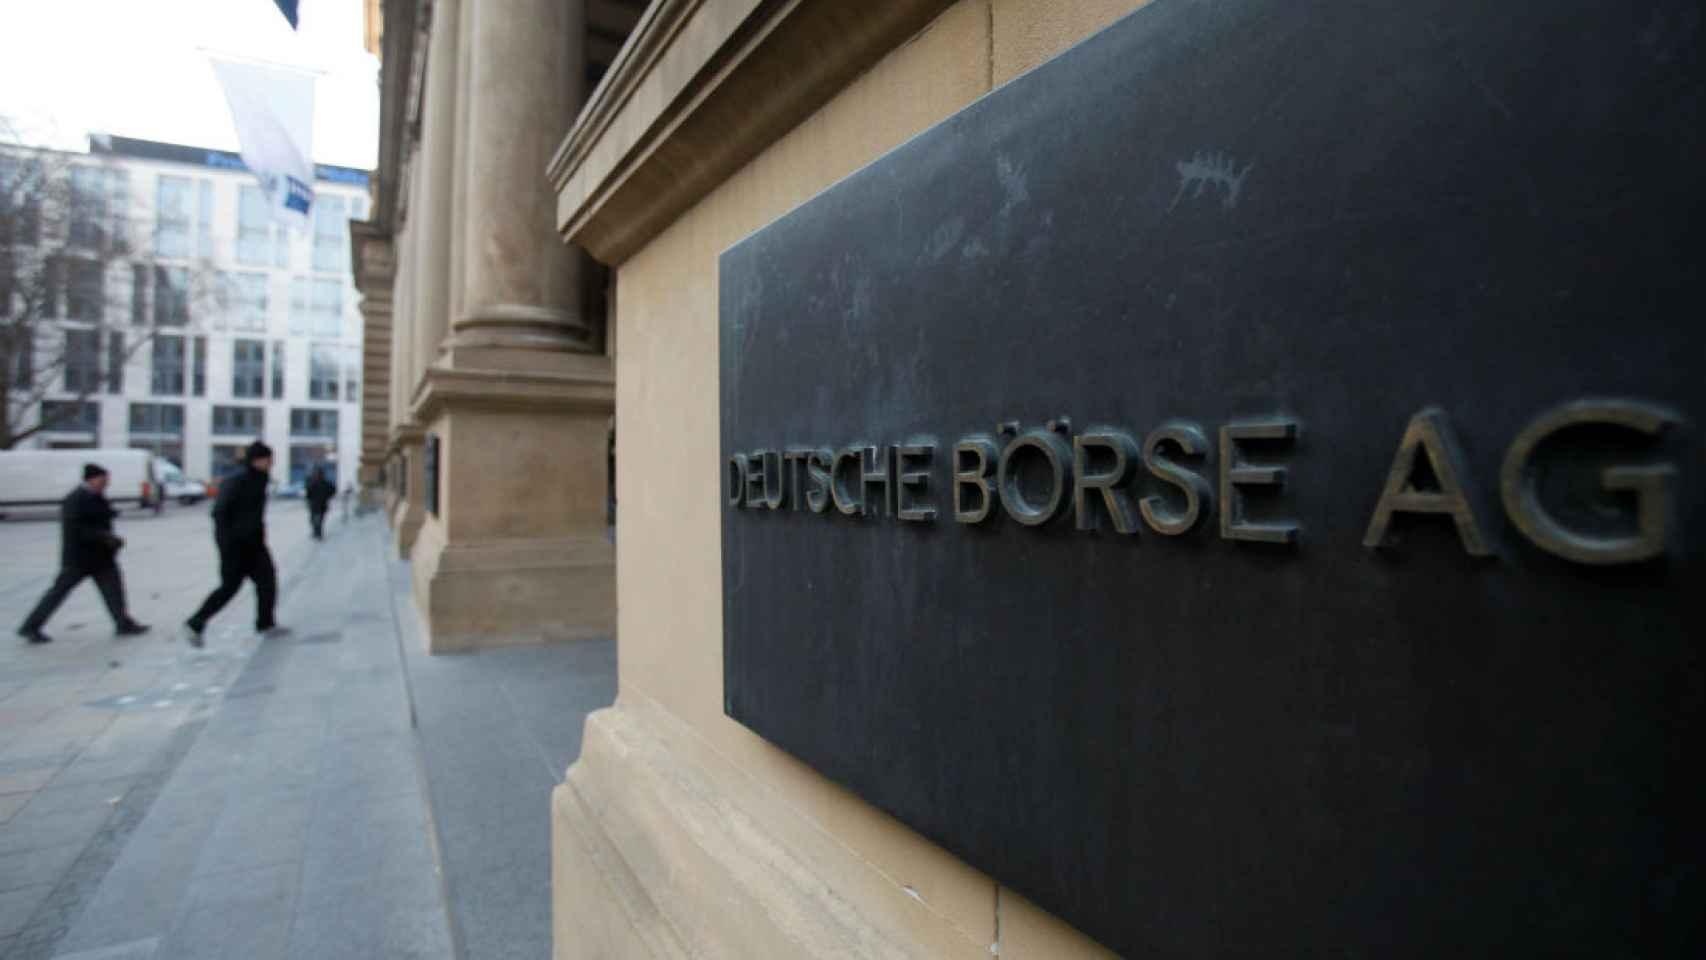 La firma germana Deutsche Börse.